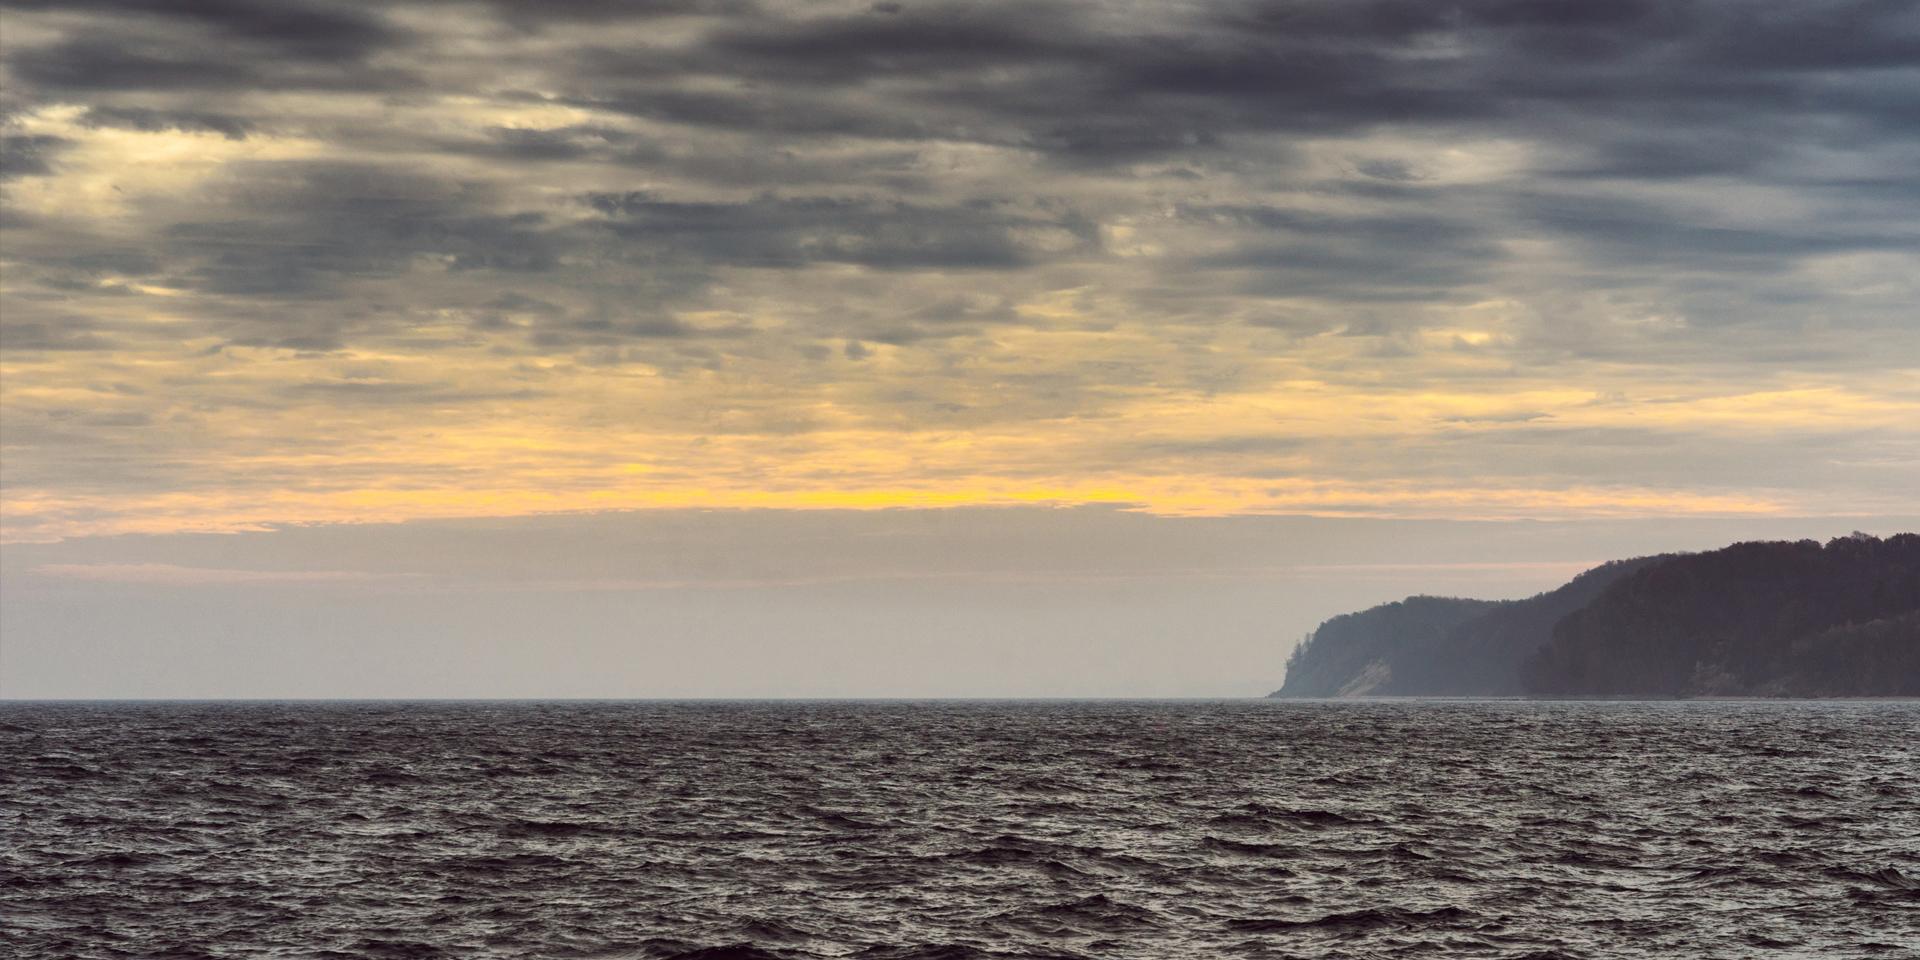 Festland, Himmel und Meer ,© pixabay/ArekSocha